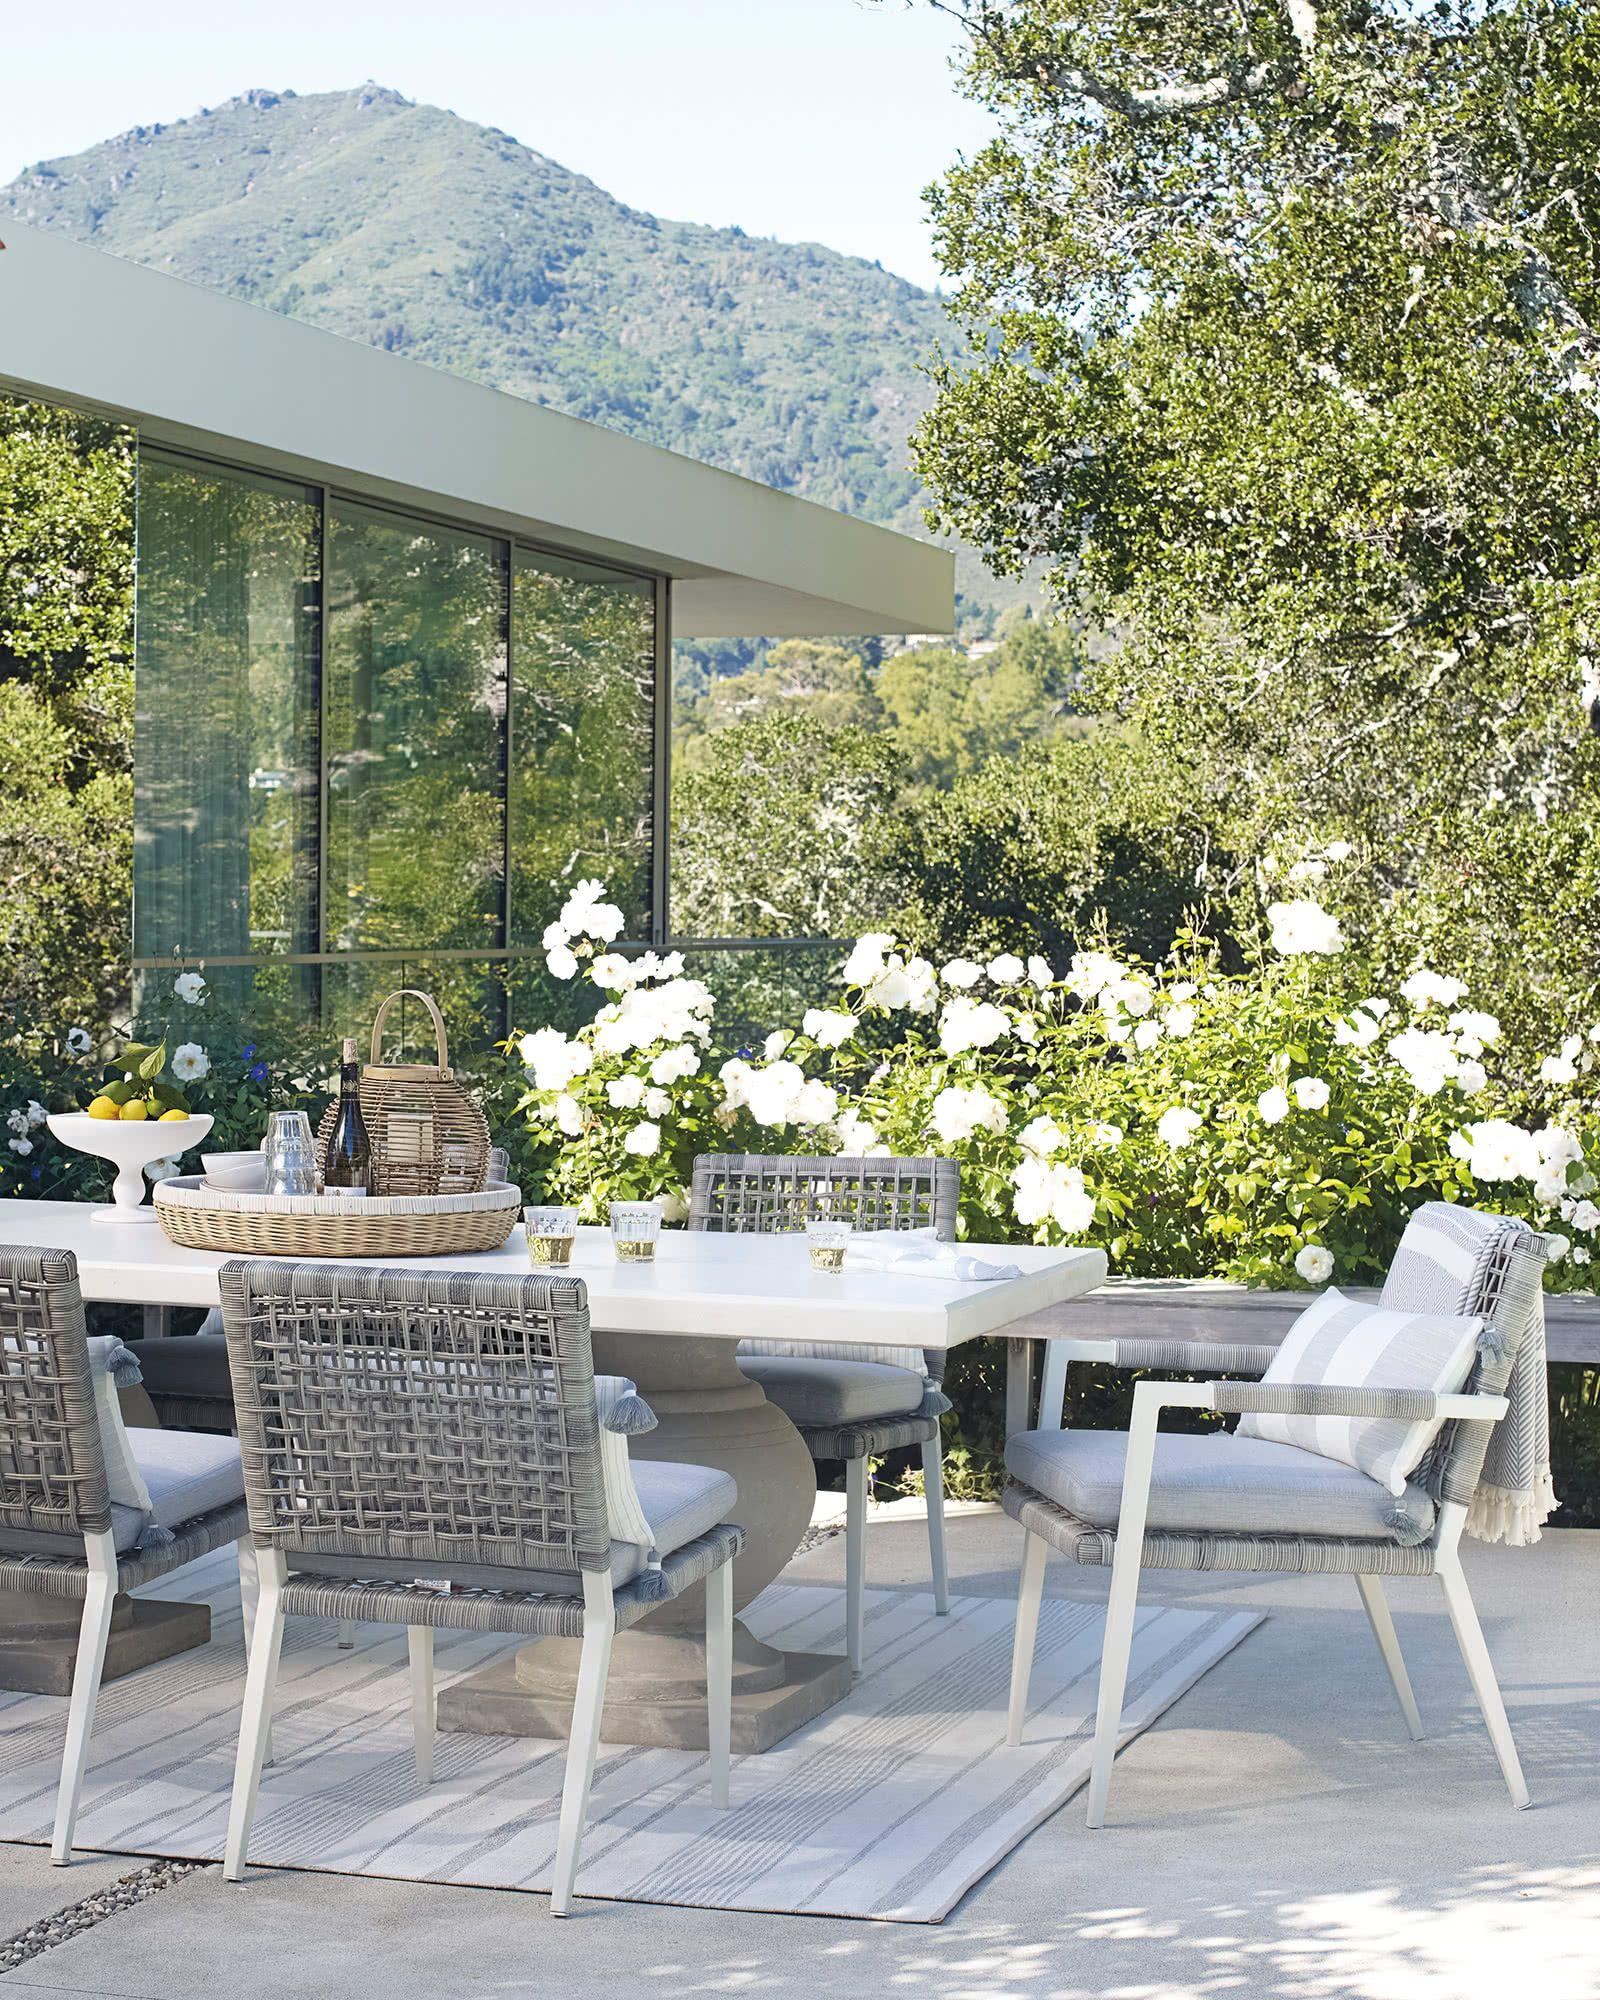 Waterfront Armchair Unique Outdoor Spaces Outdoor Outdoor Dining